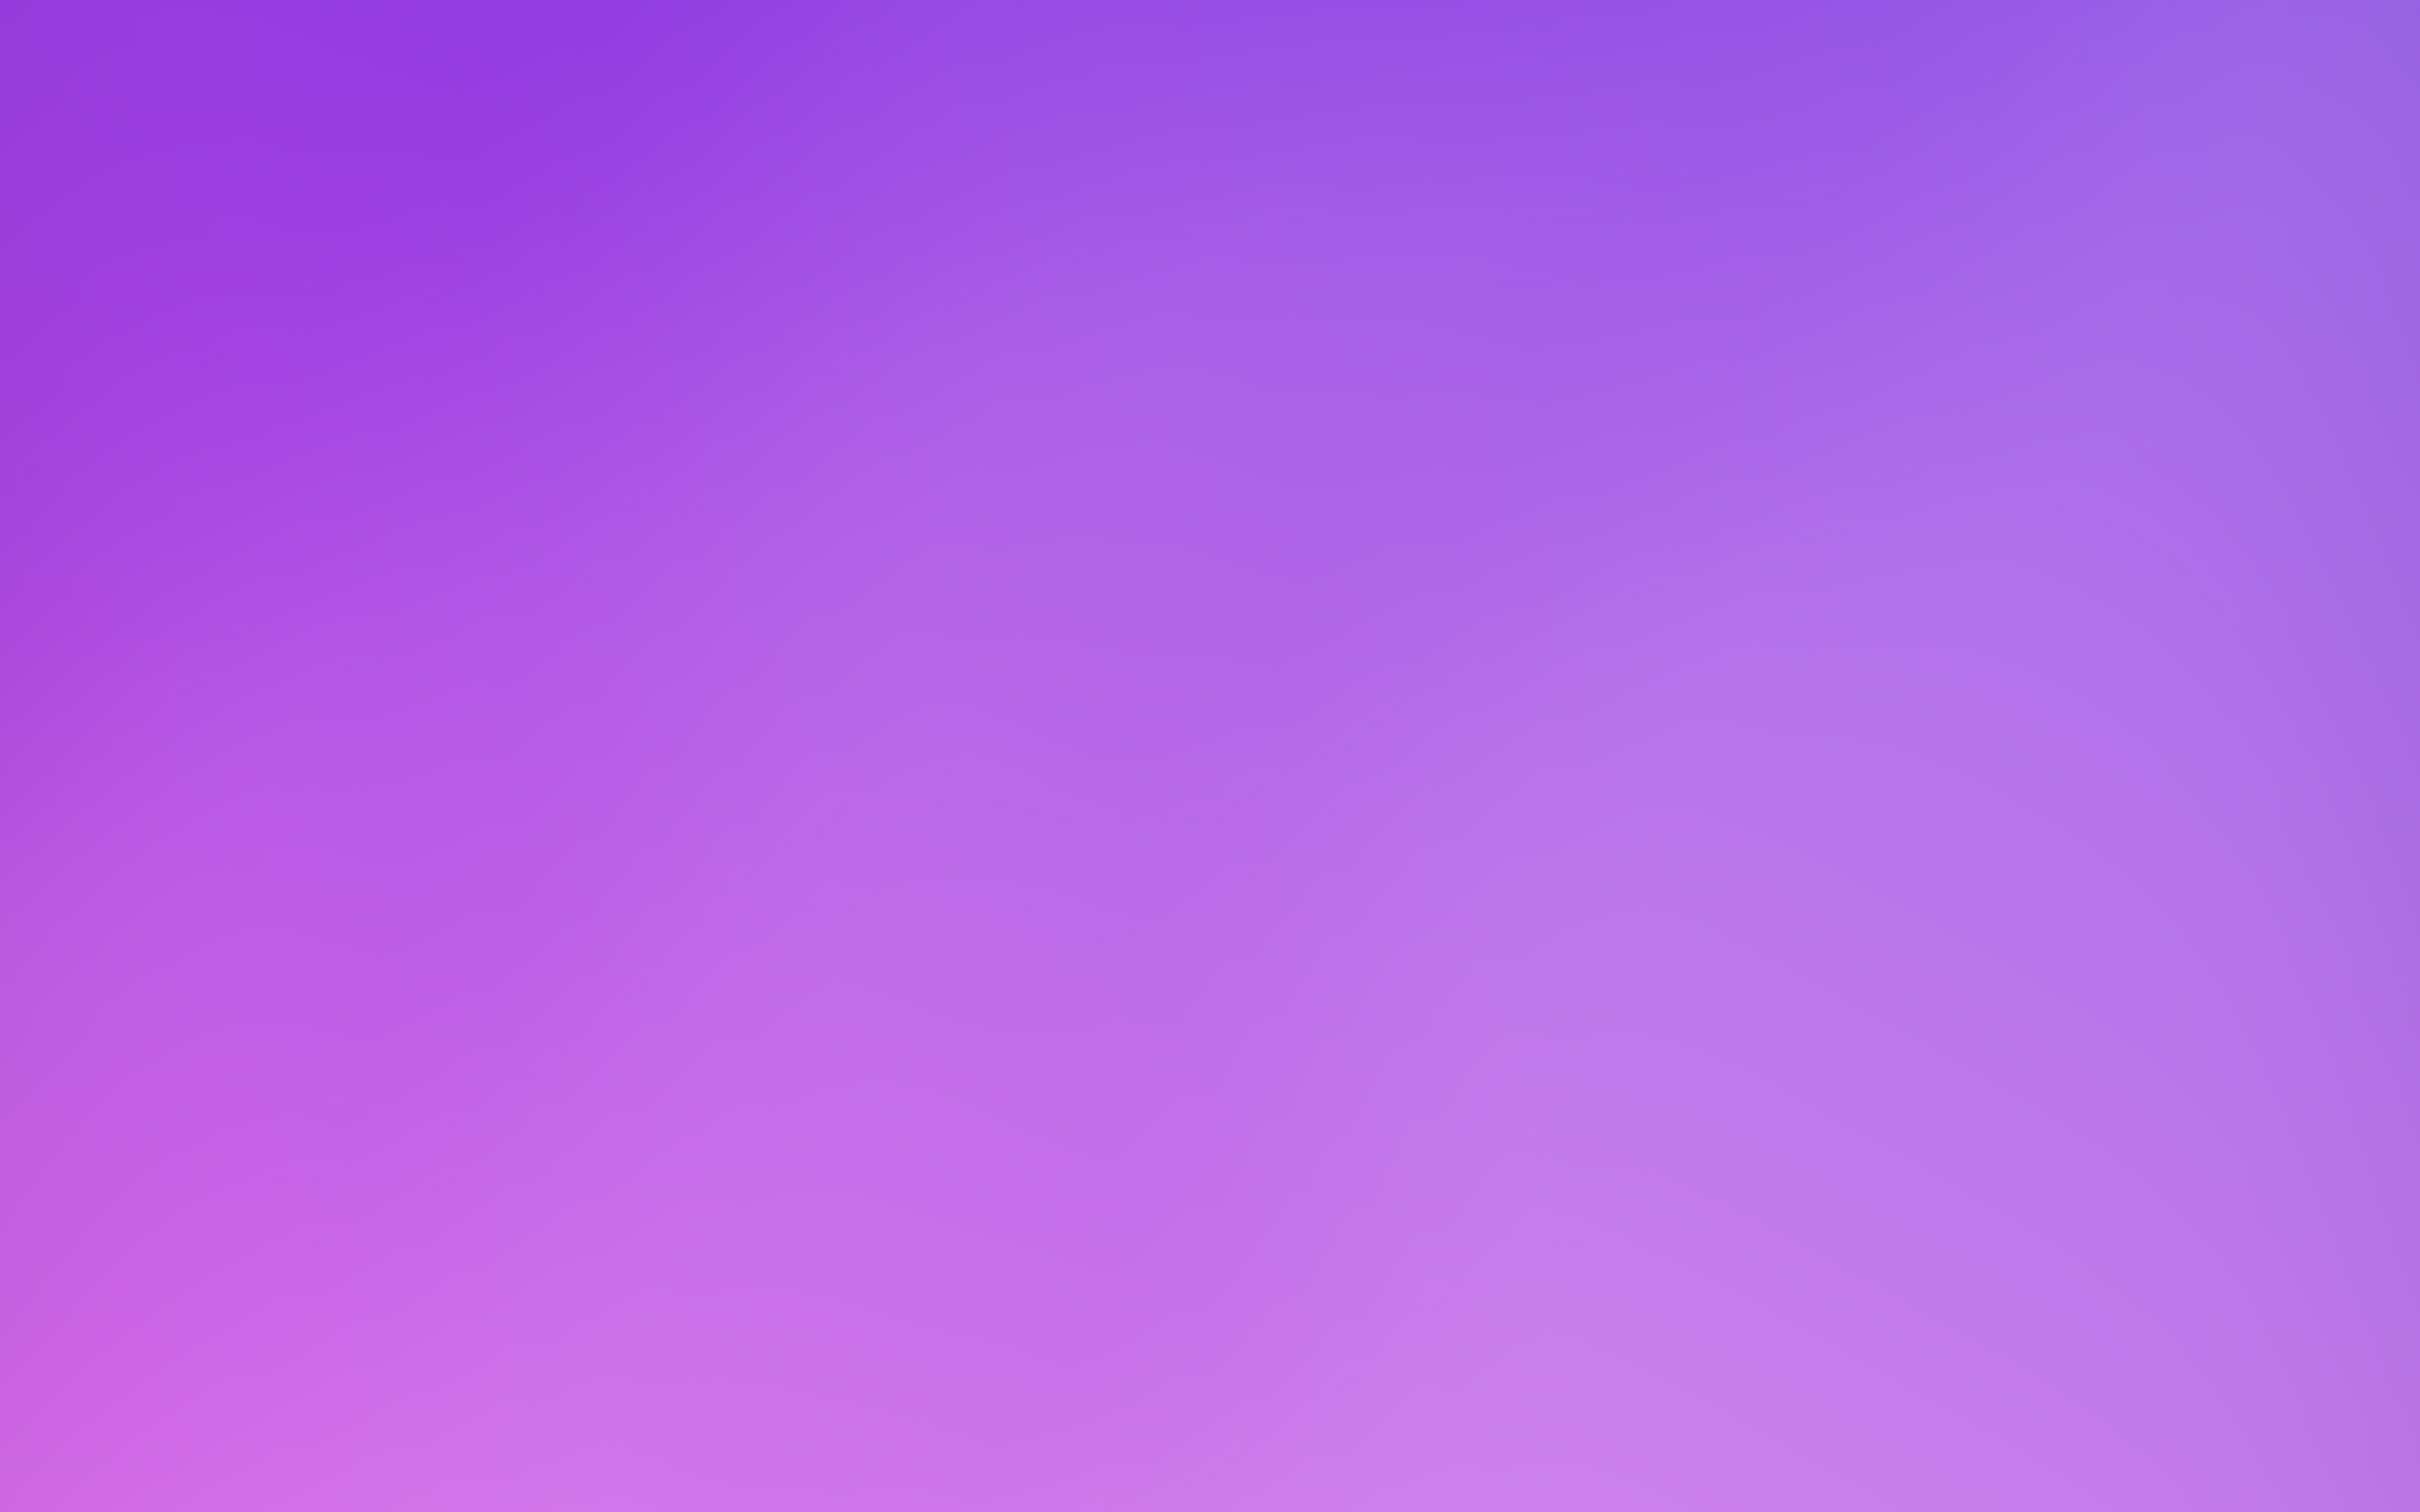 Fall Hd Wallpaper Iphone Sm01 Purple Soft Blur Gradation Wallpaper